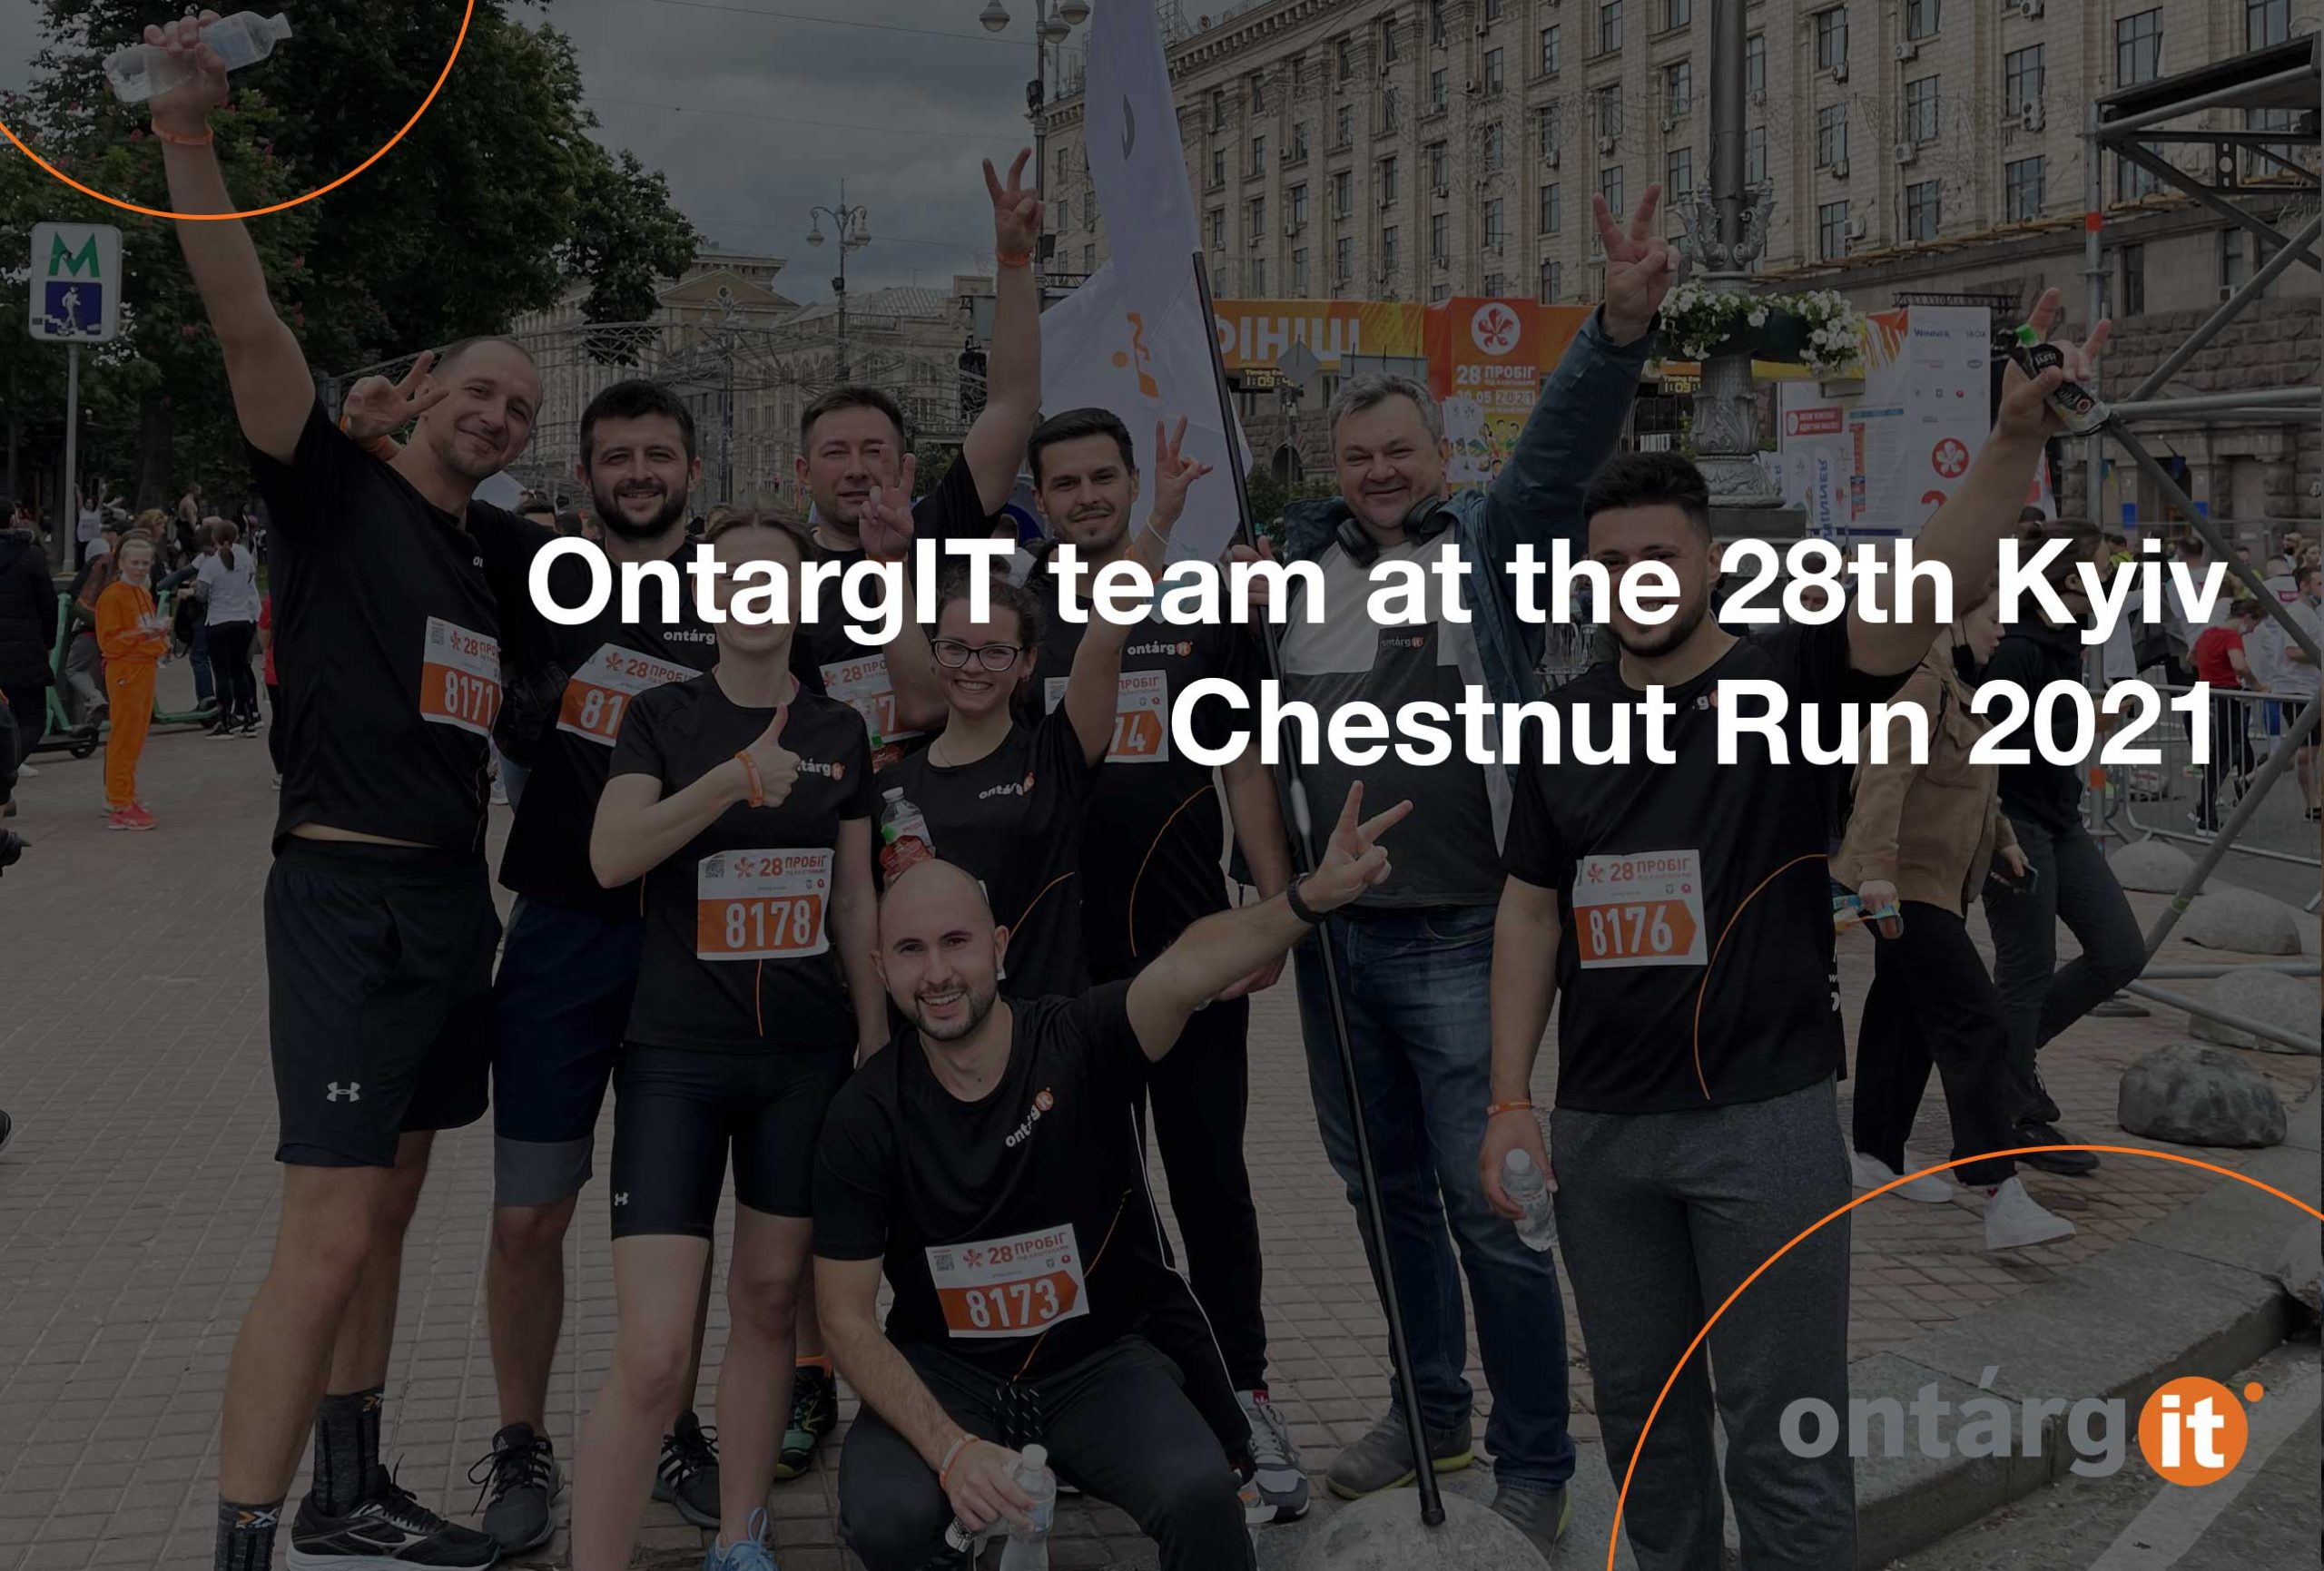 OntargIT-team-at-the-28th-Kyiv-Chestnut-Run-2021